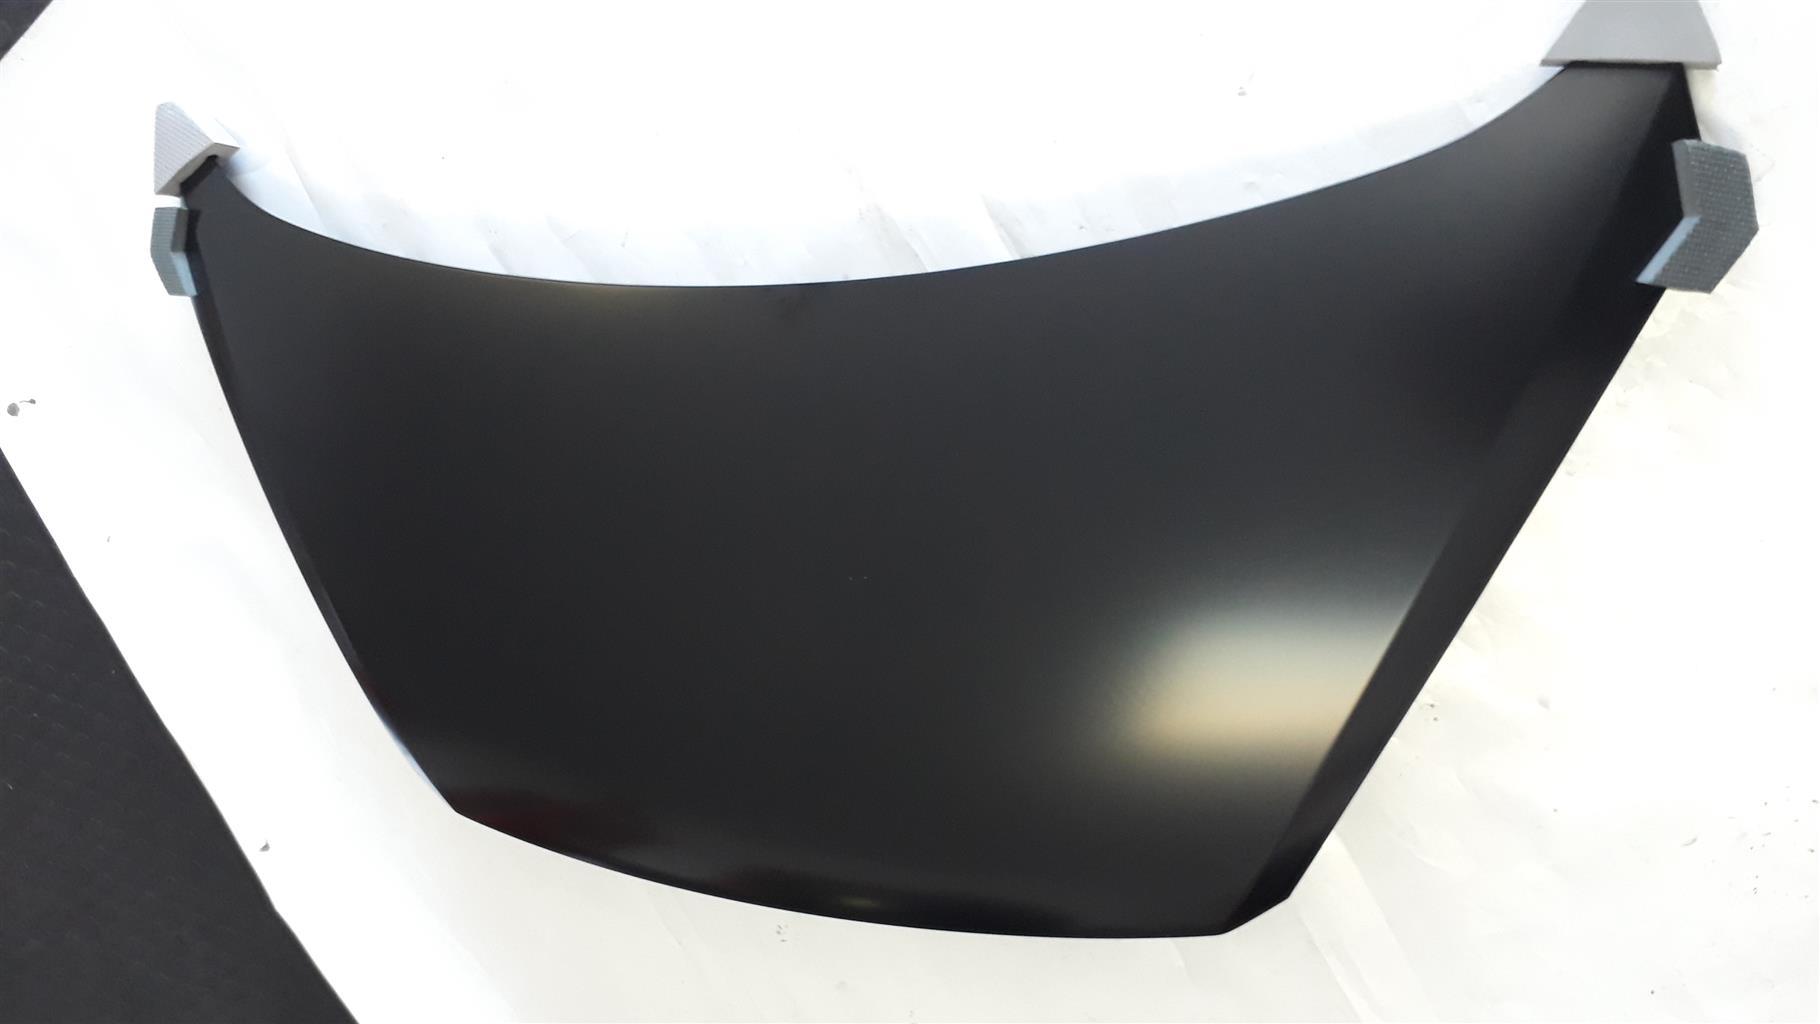 New Bonnet For KIA PICANTO For Sale